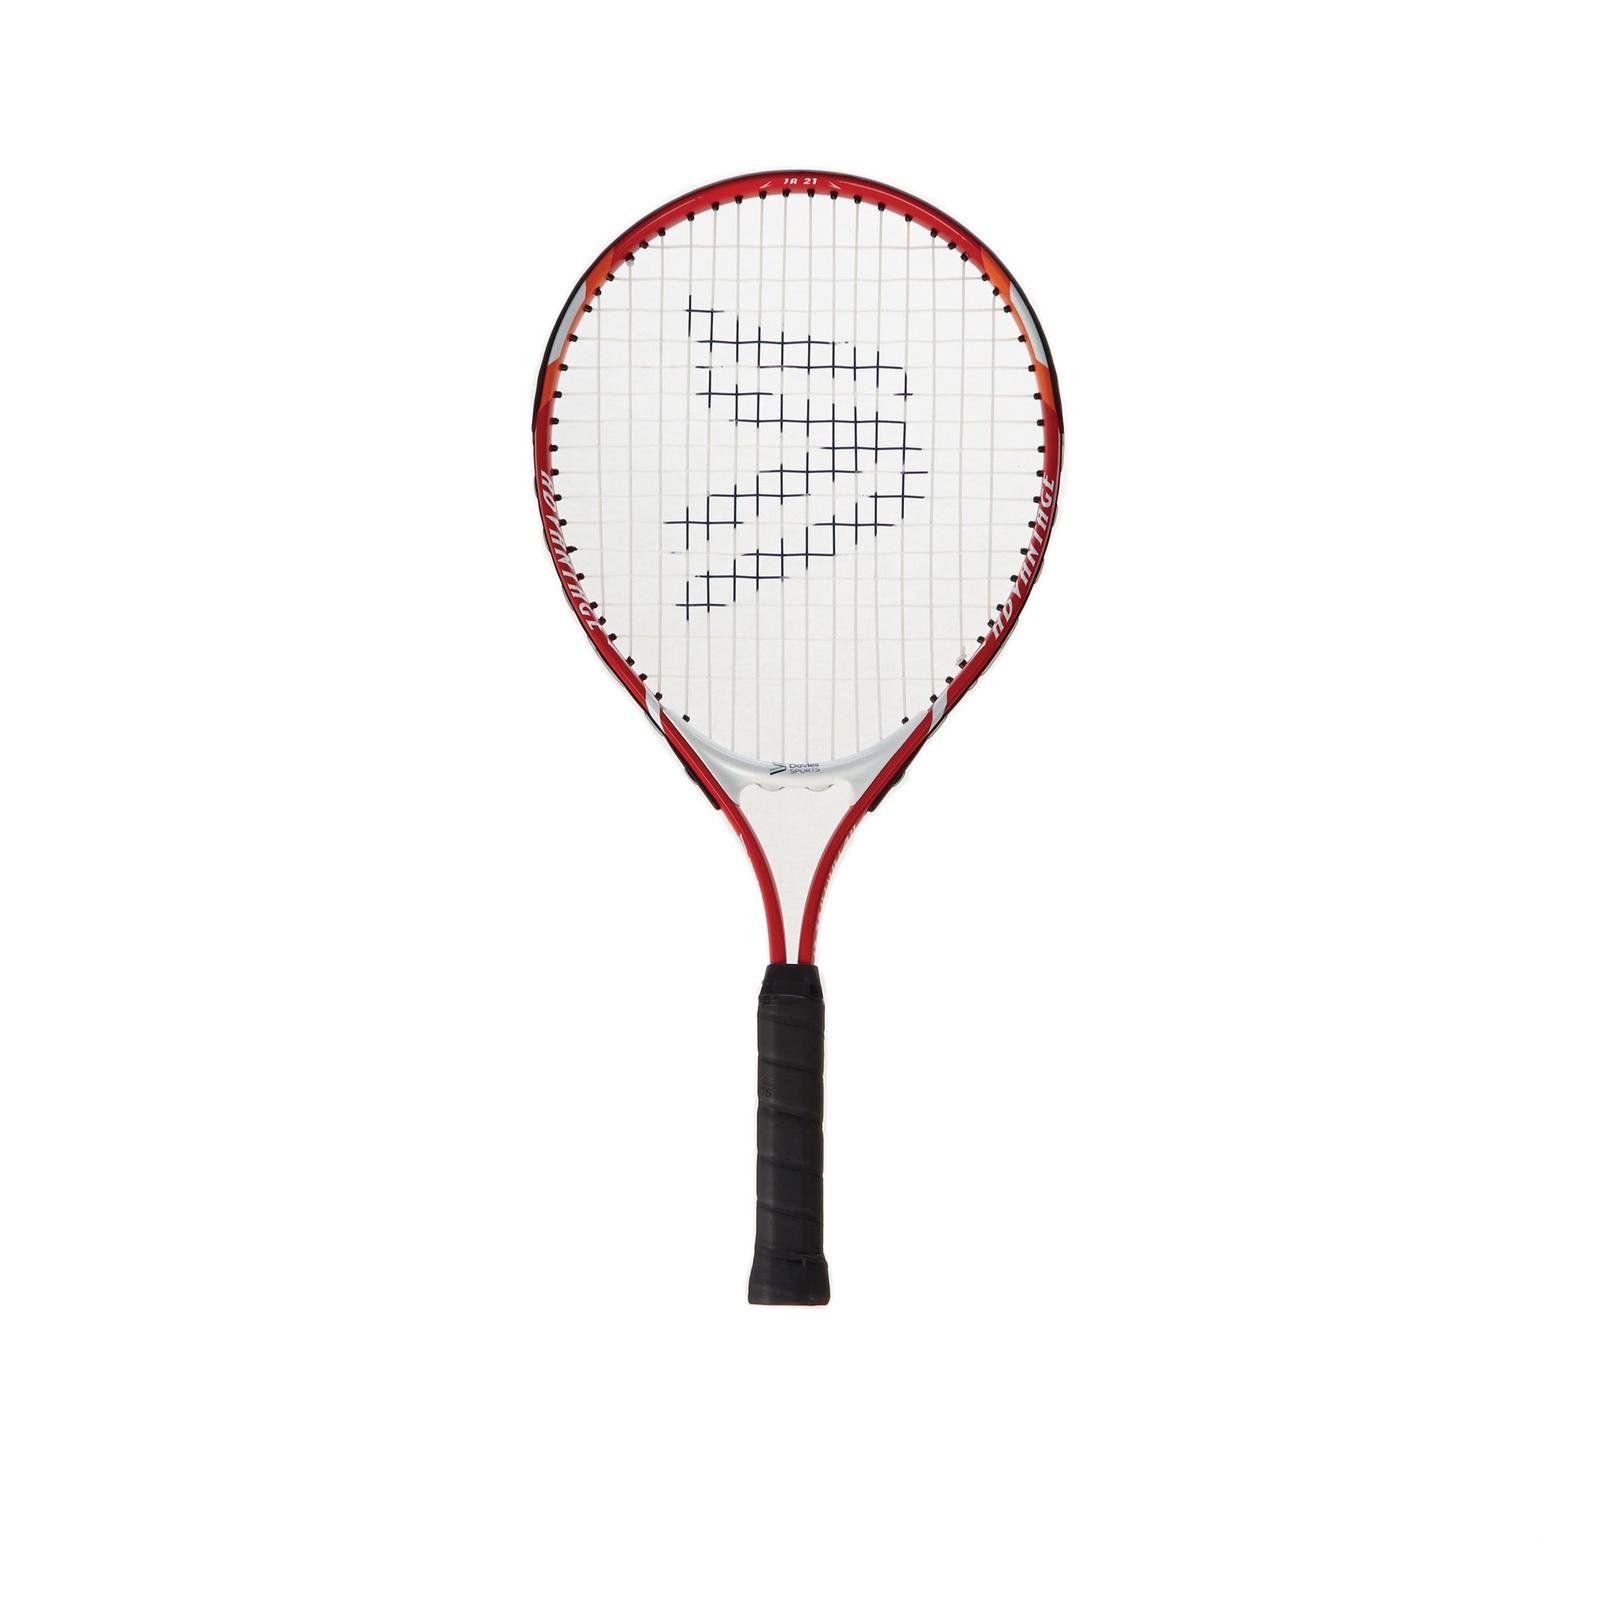 Davies Sports 21in Advantage Racquet